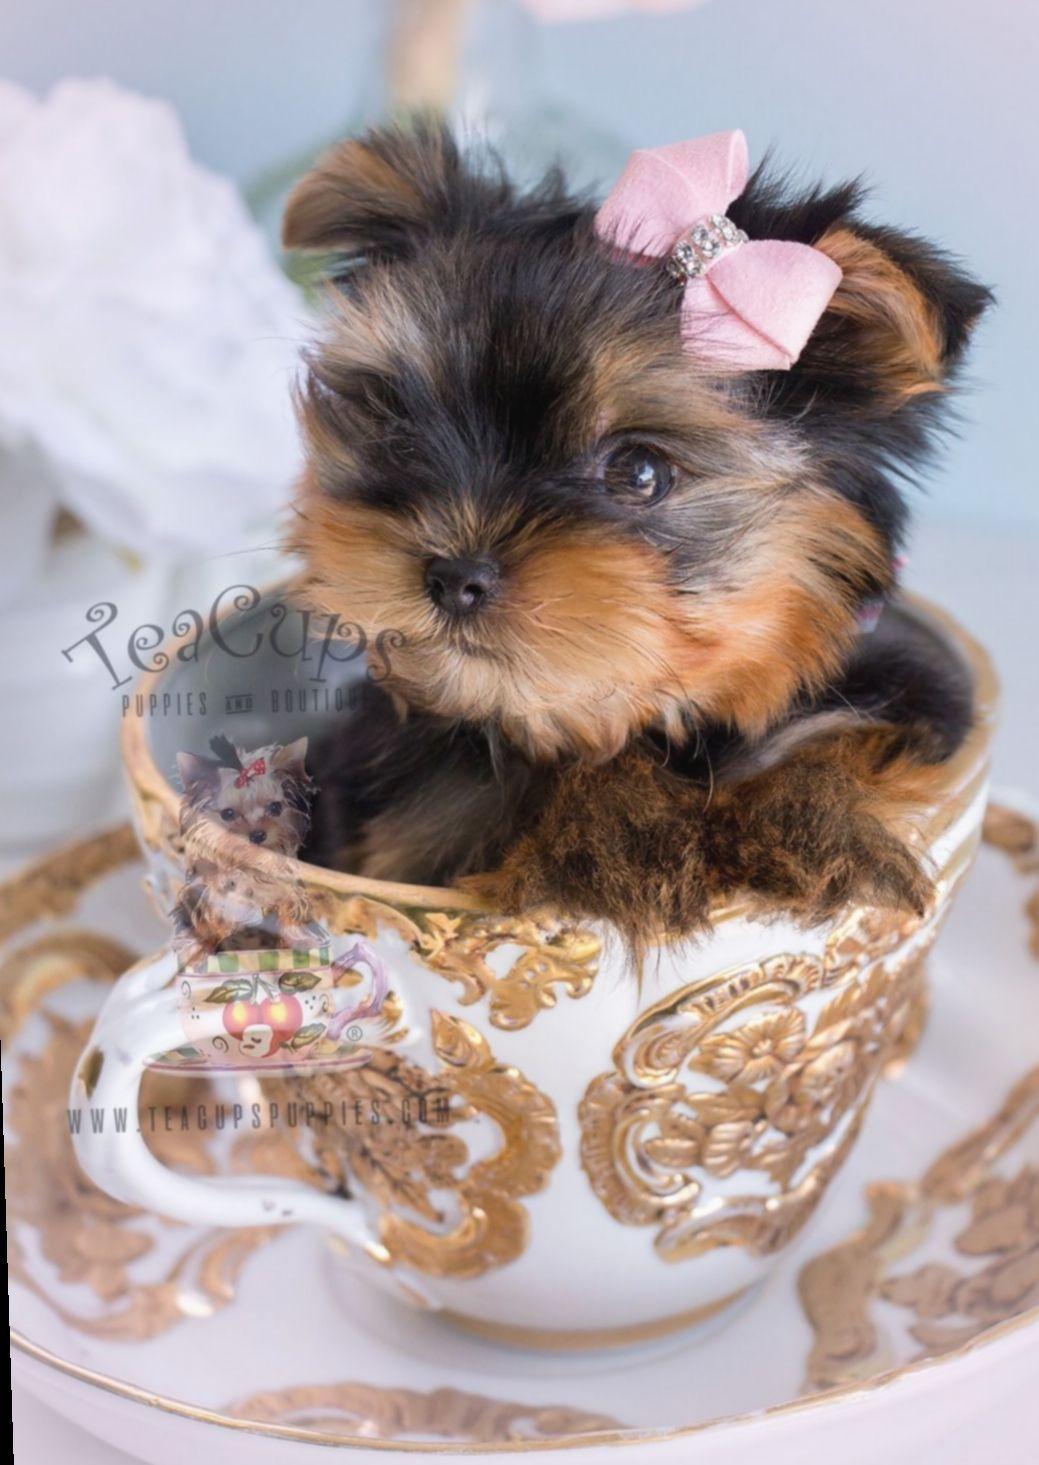 Cute Puppies Yorkies Baby Miniensaiodiadascriancas Candy Ensaioinfantil Yorkie Puppy For Sale Yorkshire Terrier Puppies Yorkie Puppy